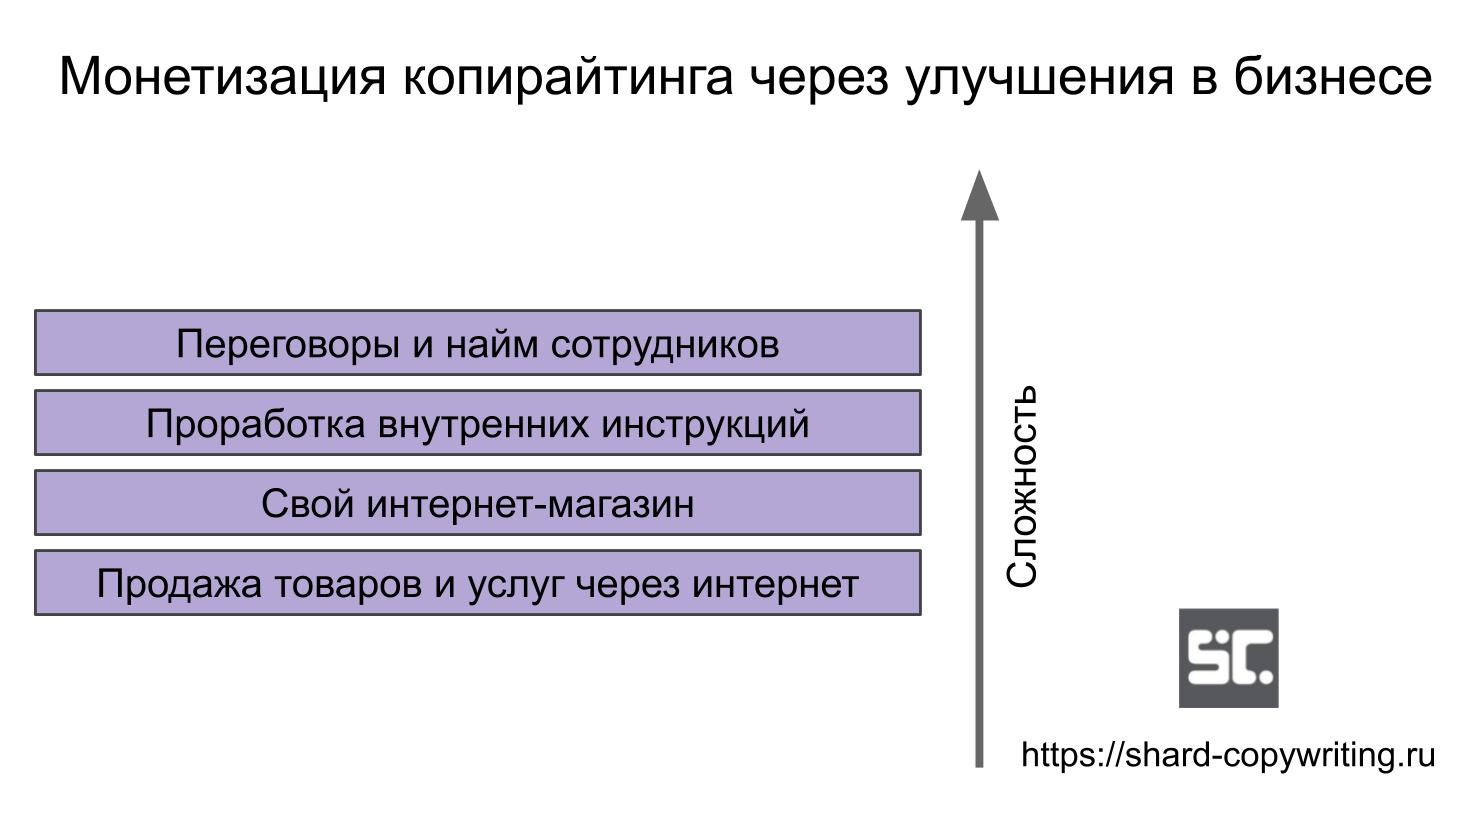 Монетизация копирайтинга через бизнес